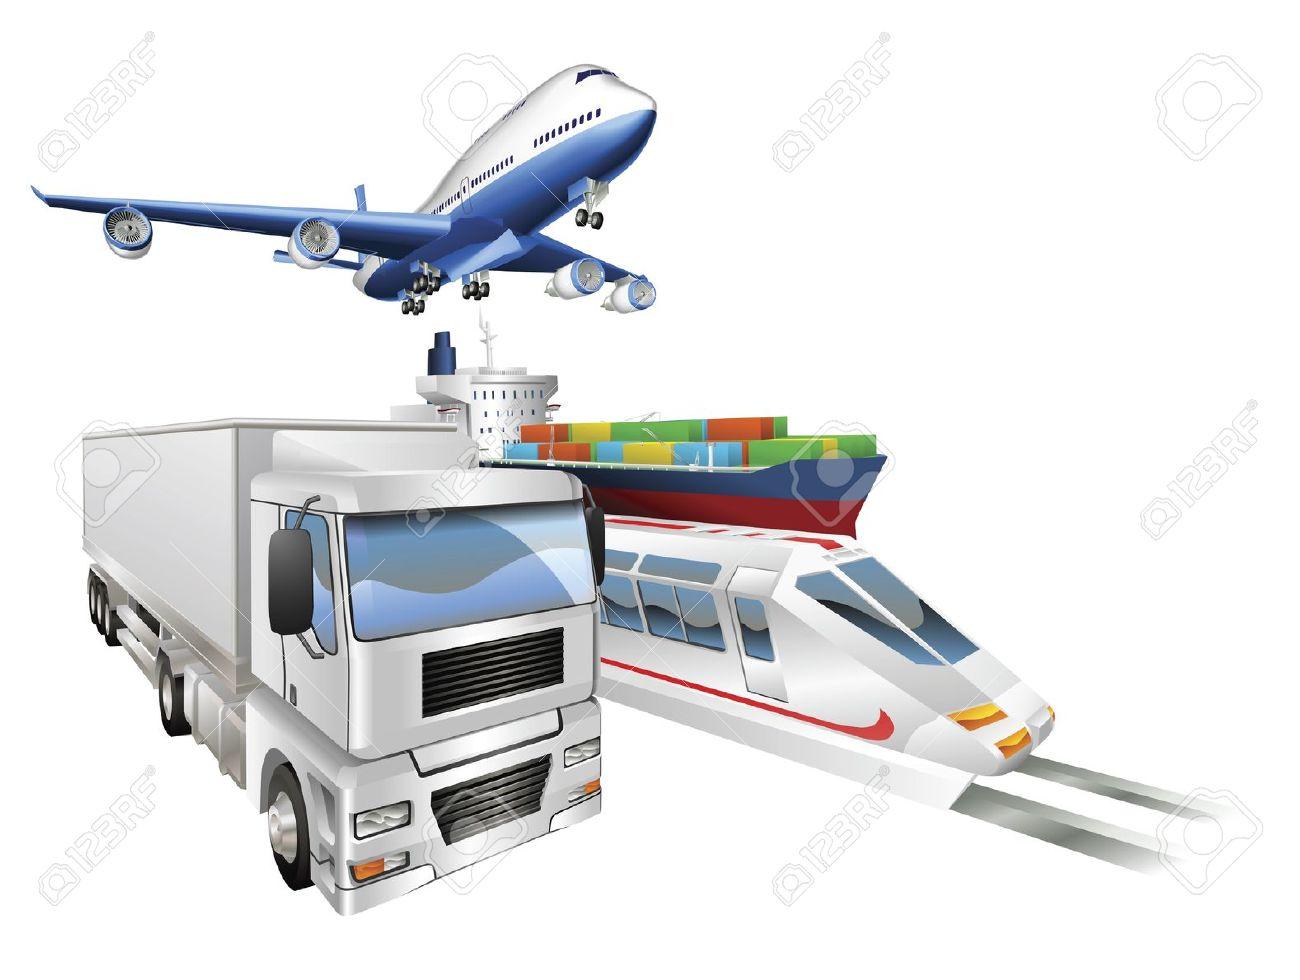 Distribution plane clipart.